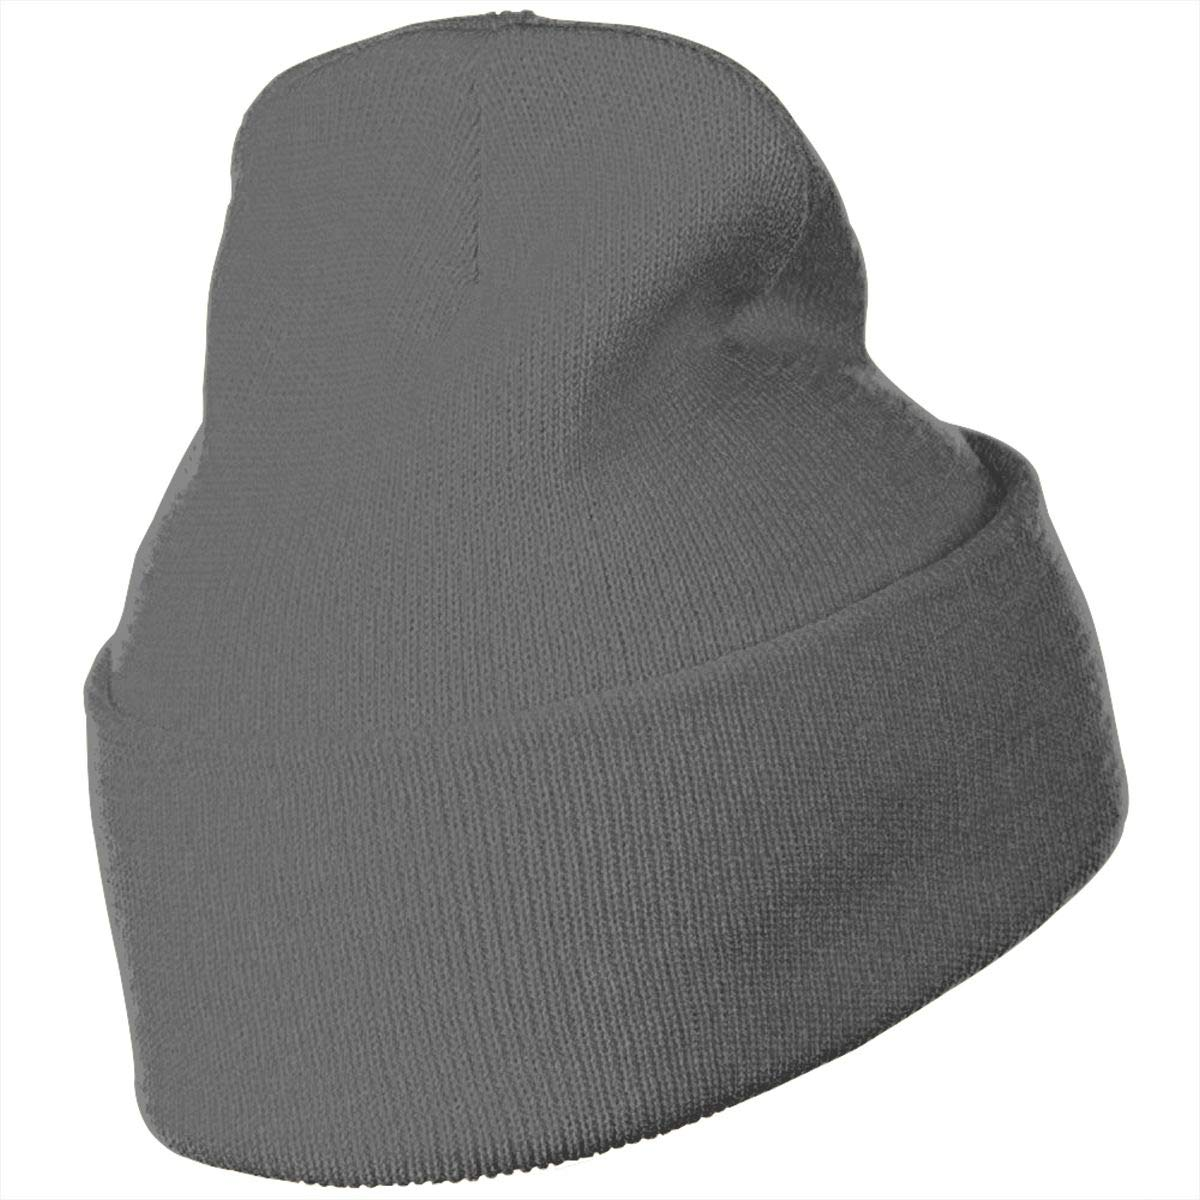 QZqDQ Stay Woke Unisex Fashion Knitted Hat Luxury Hip-Hop Cap